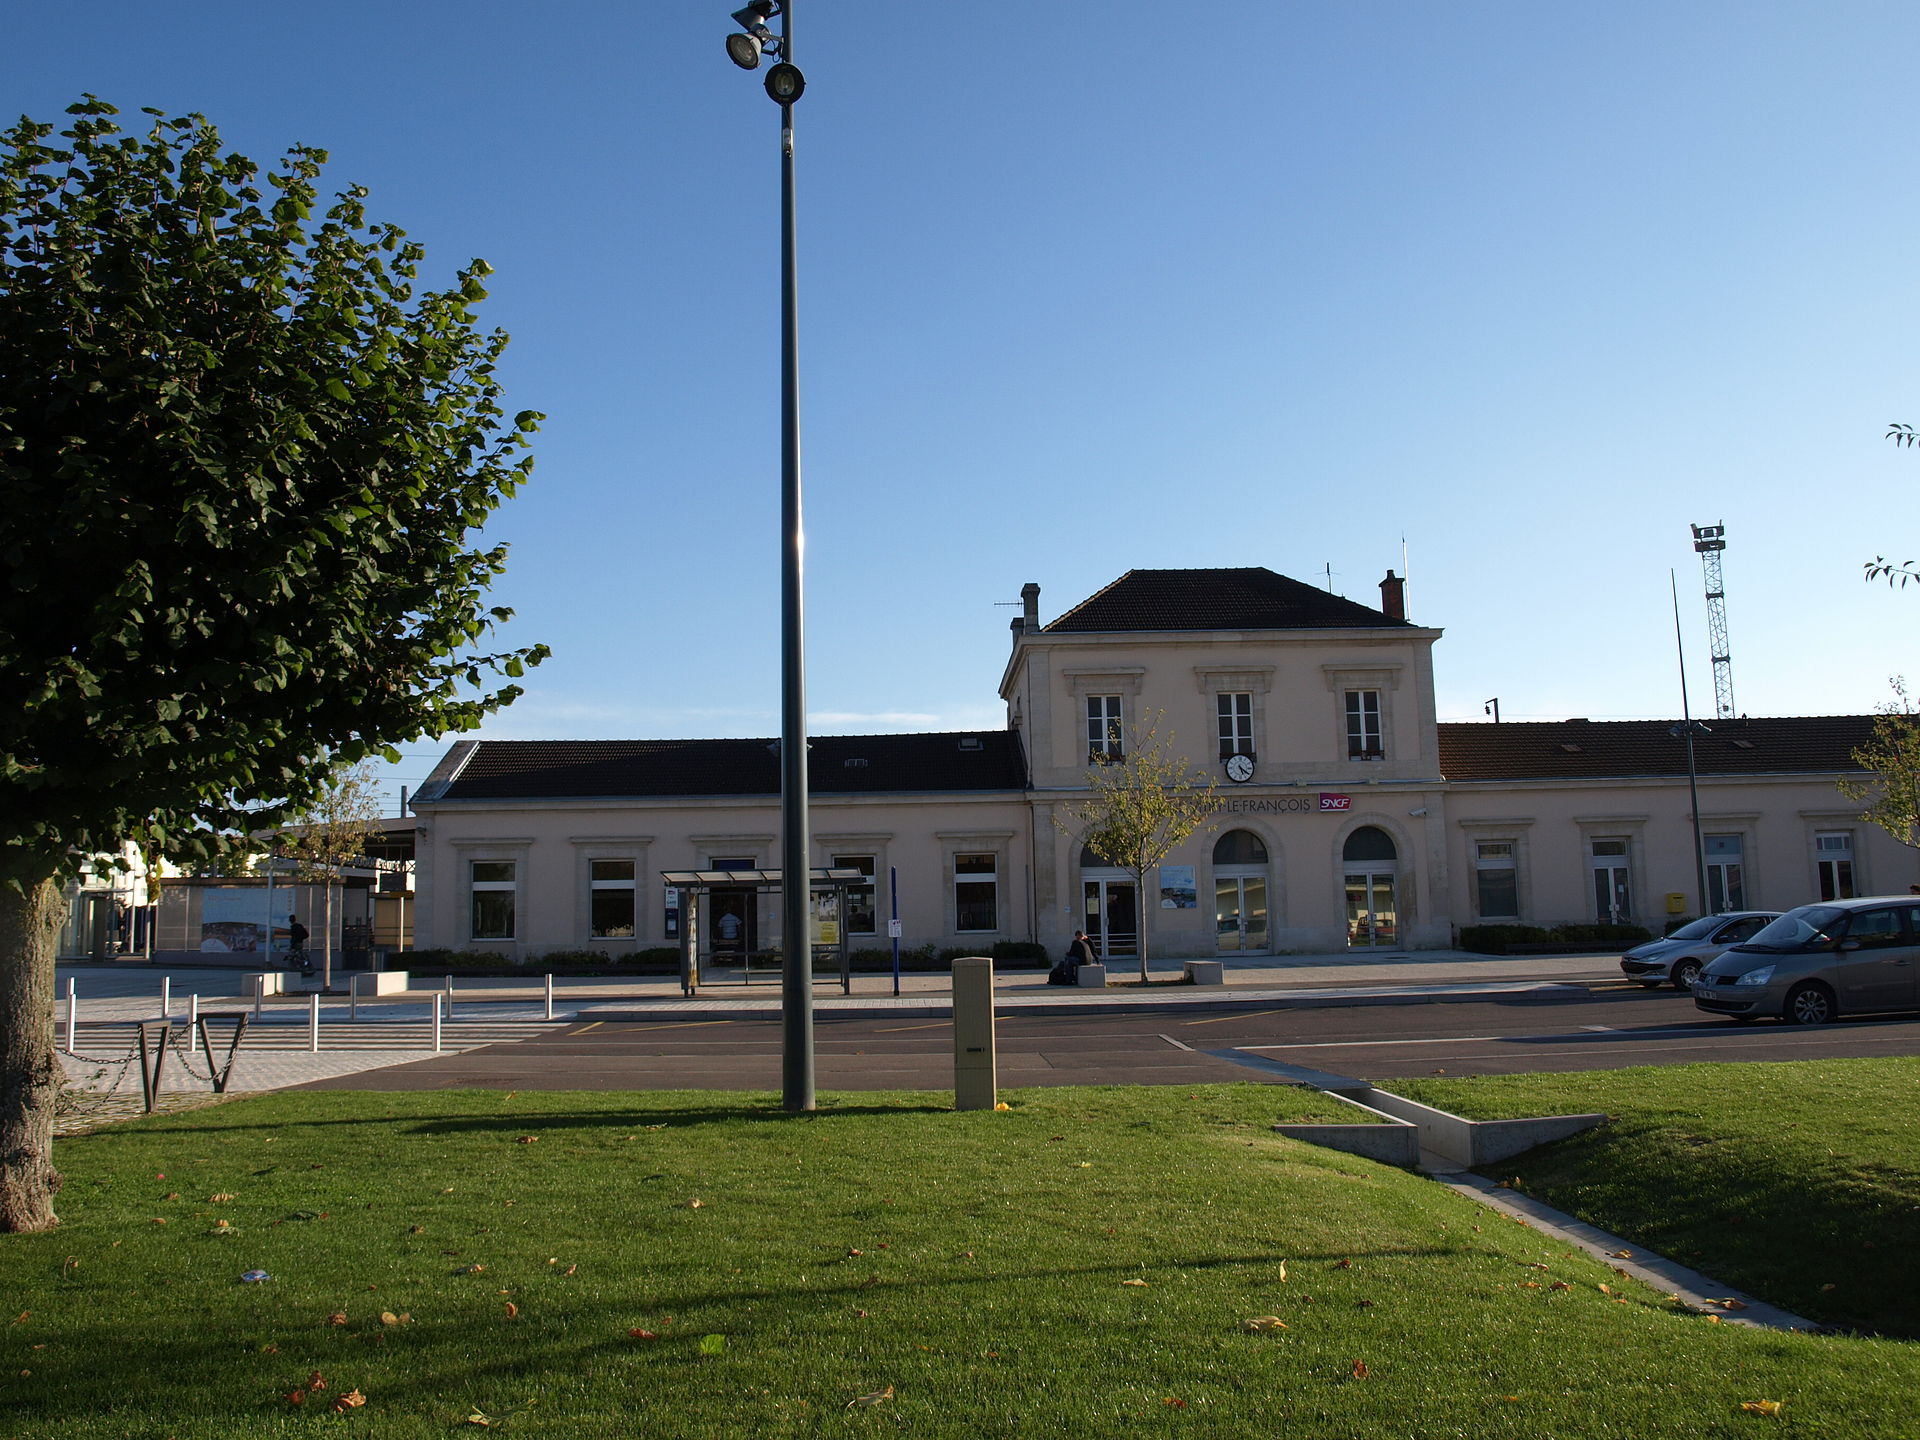 Gare de vitry le fran ois wikipedia for Garage vitry le francois